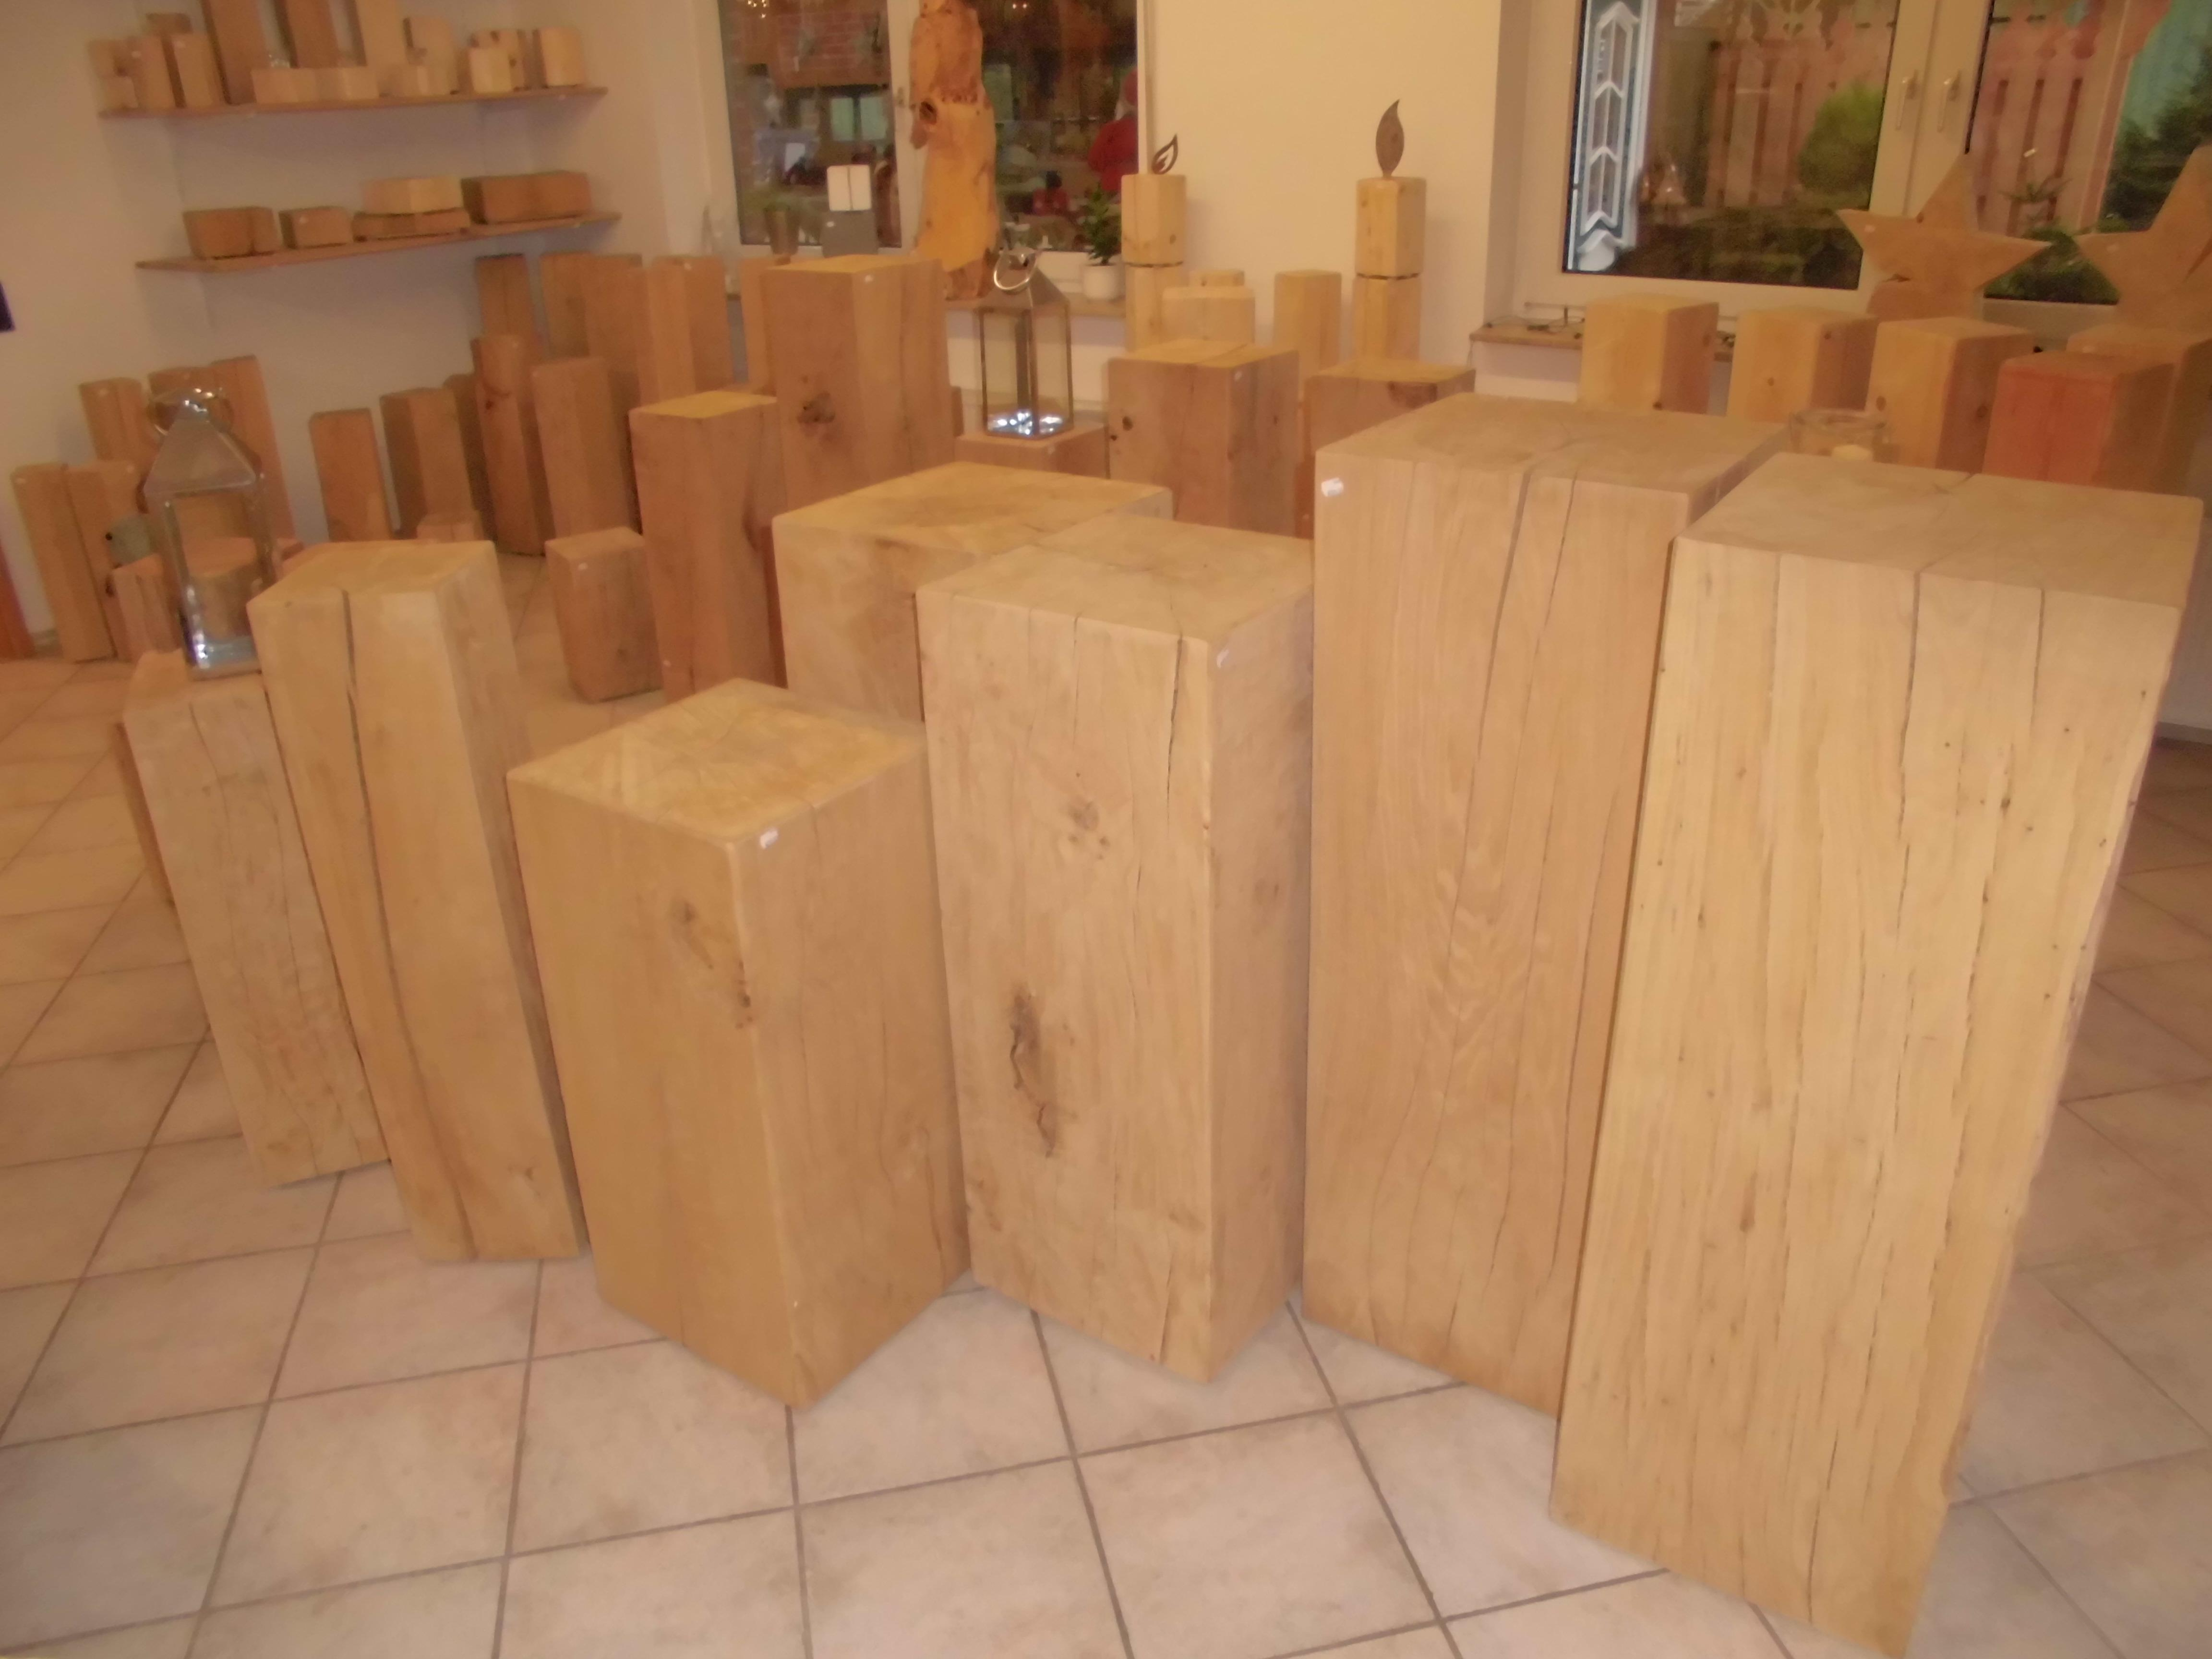 Eichenholzsäule gehobelt, geschliffen, angefast 40x40x120cm